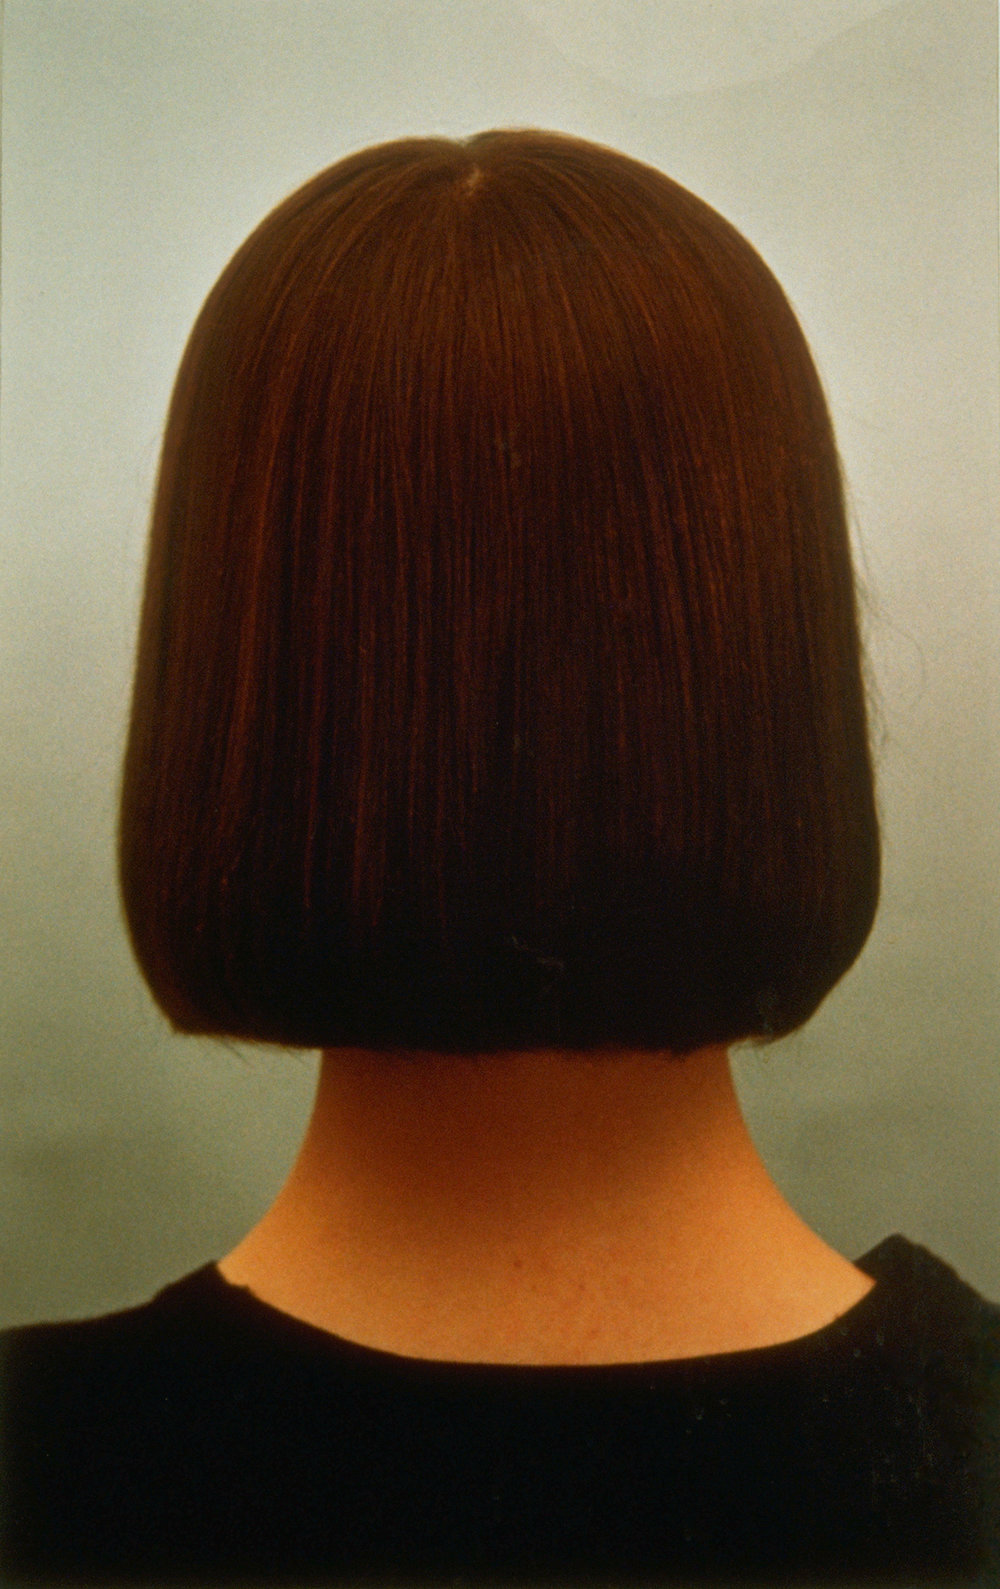 Head 6, 1989